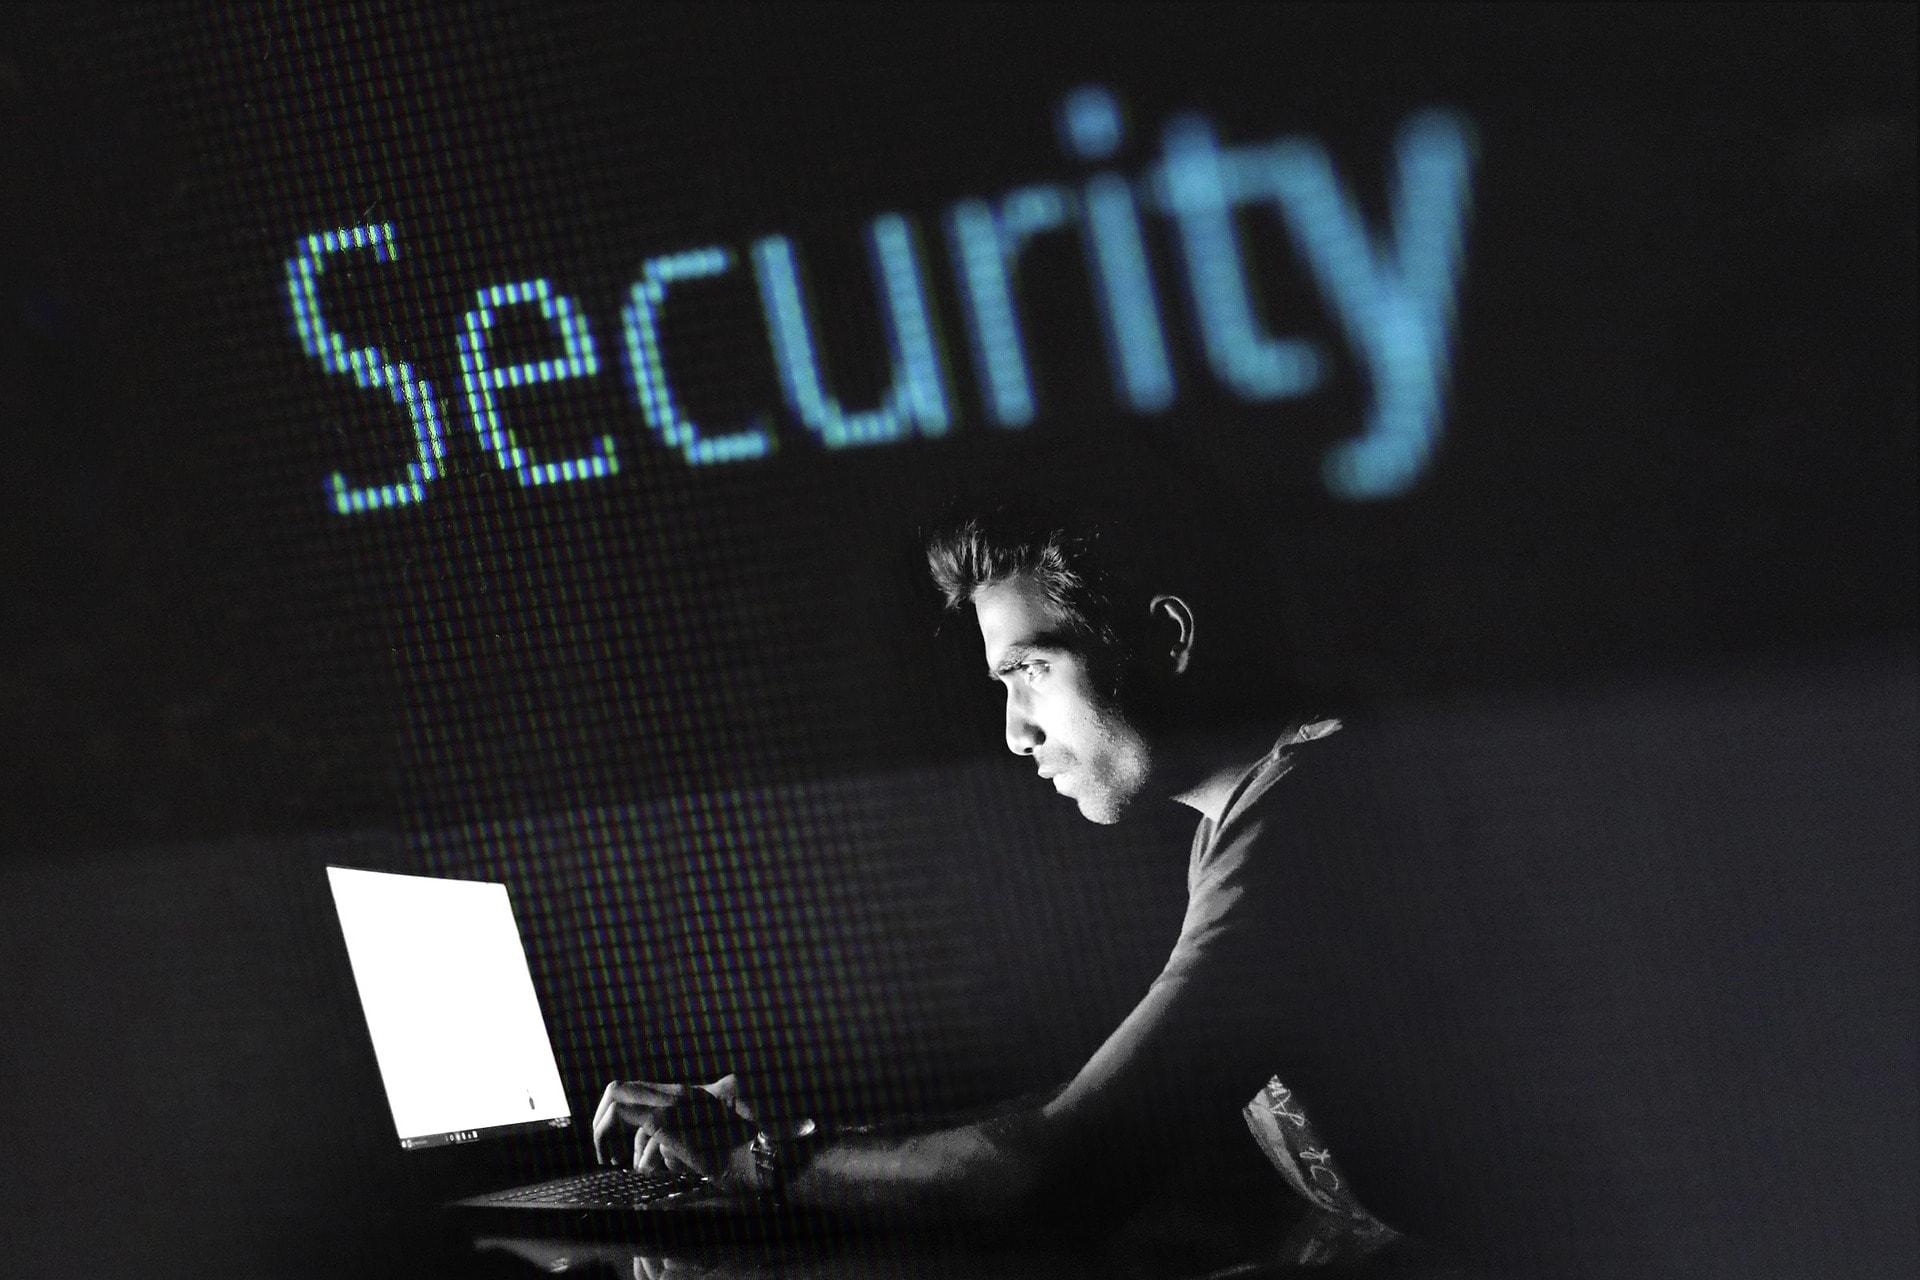 La cyber-security dal tocco umano